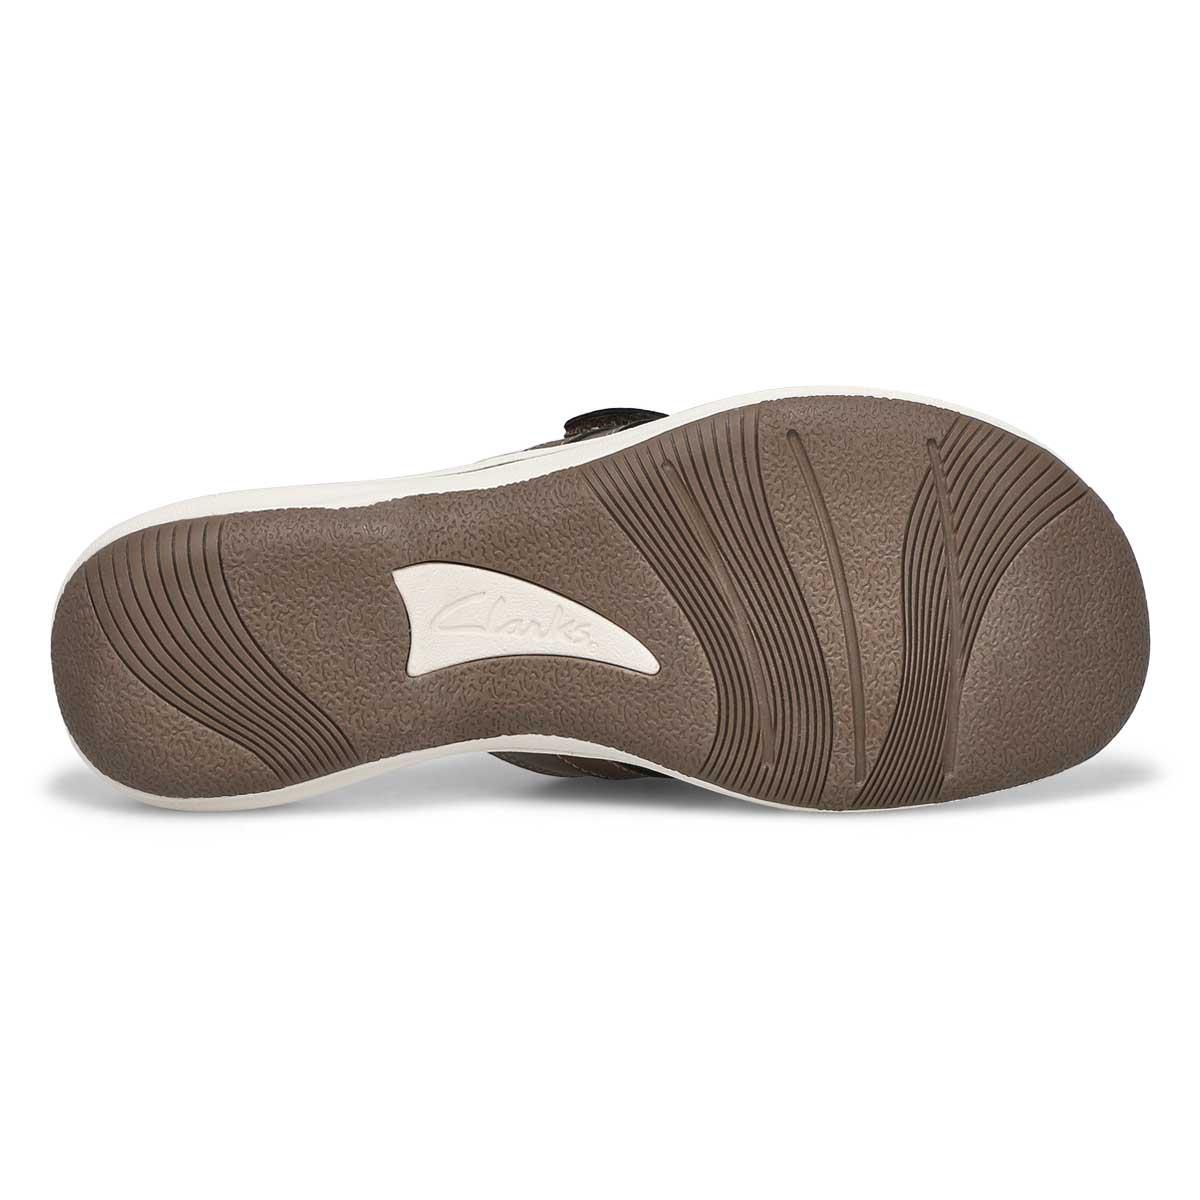 Women's Breeze Sea Thong Sandal - Pewter